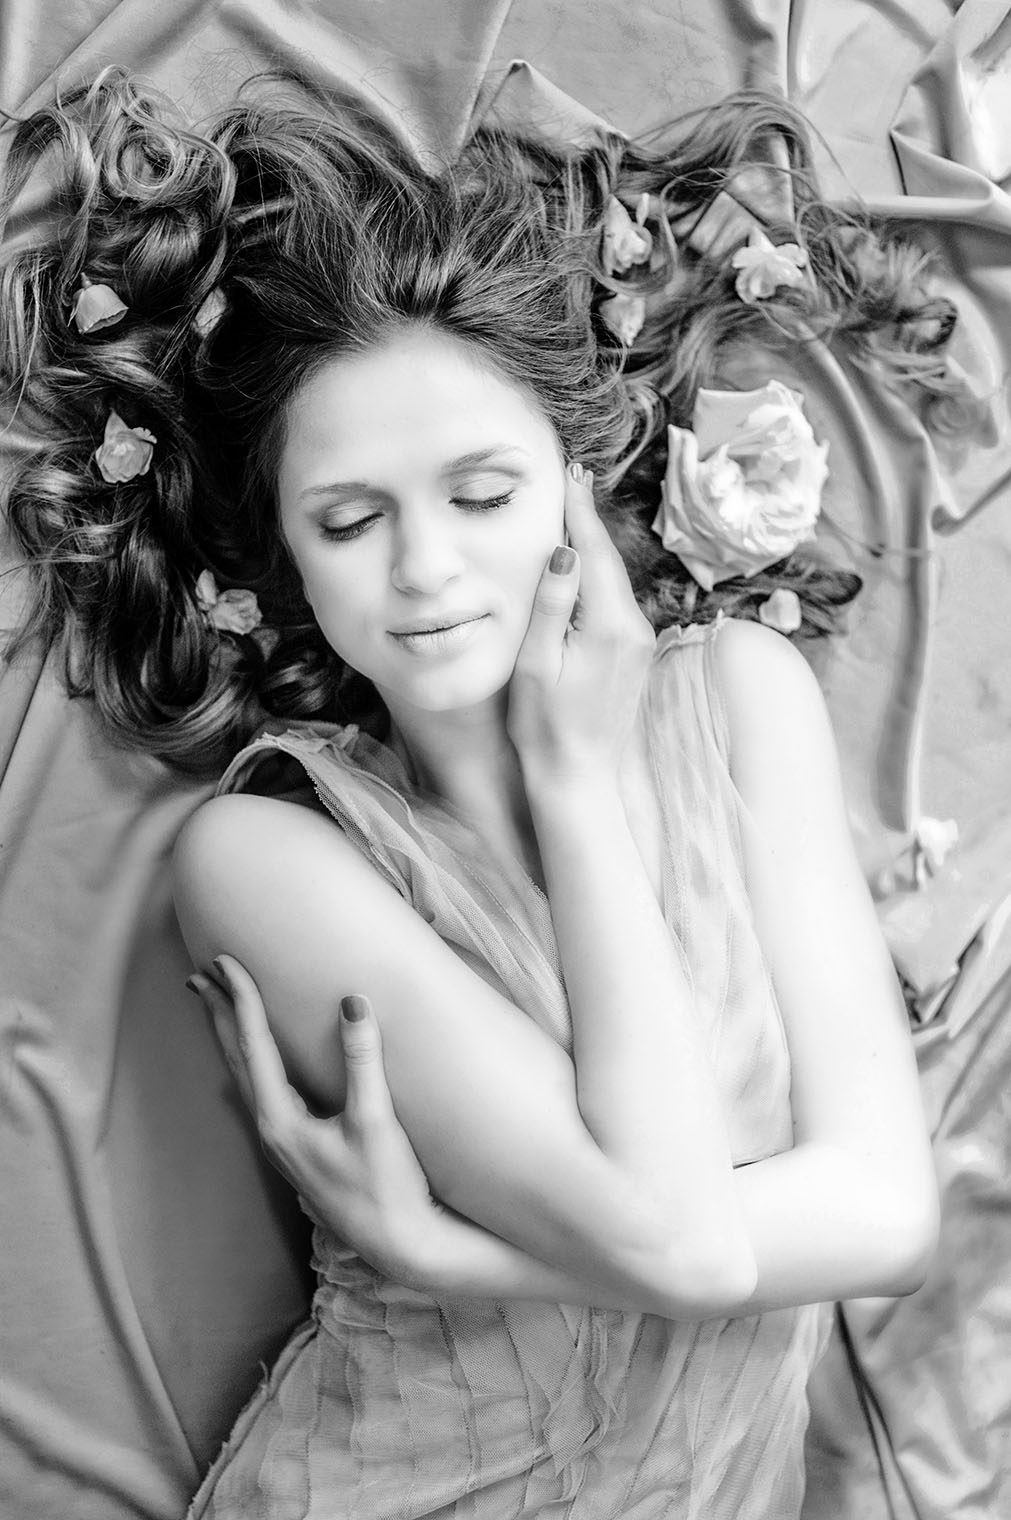 model photoshooting photo modeling Portraiture Moody Portraits  Visuals photosession model agency